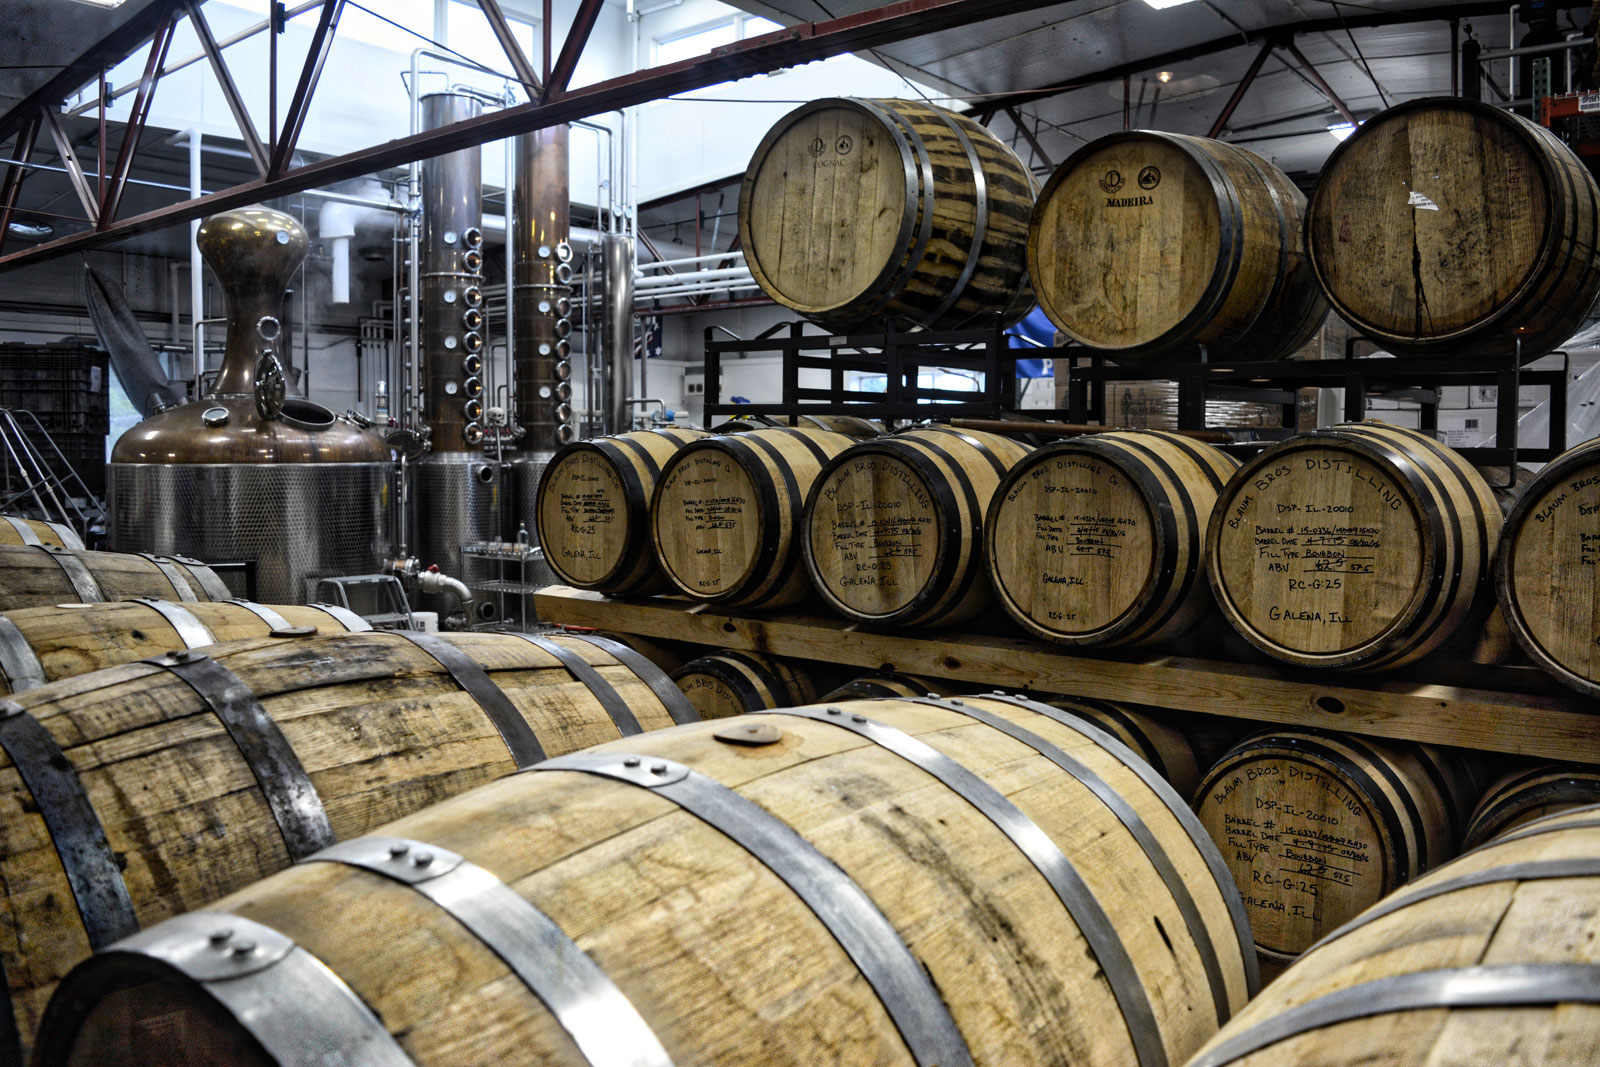 Blaum Bros. Distilling Co